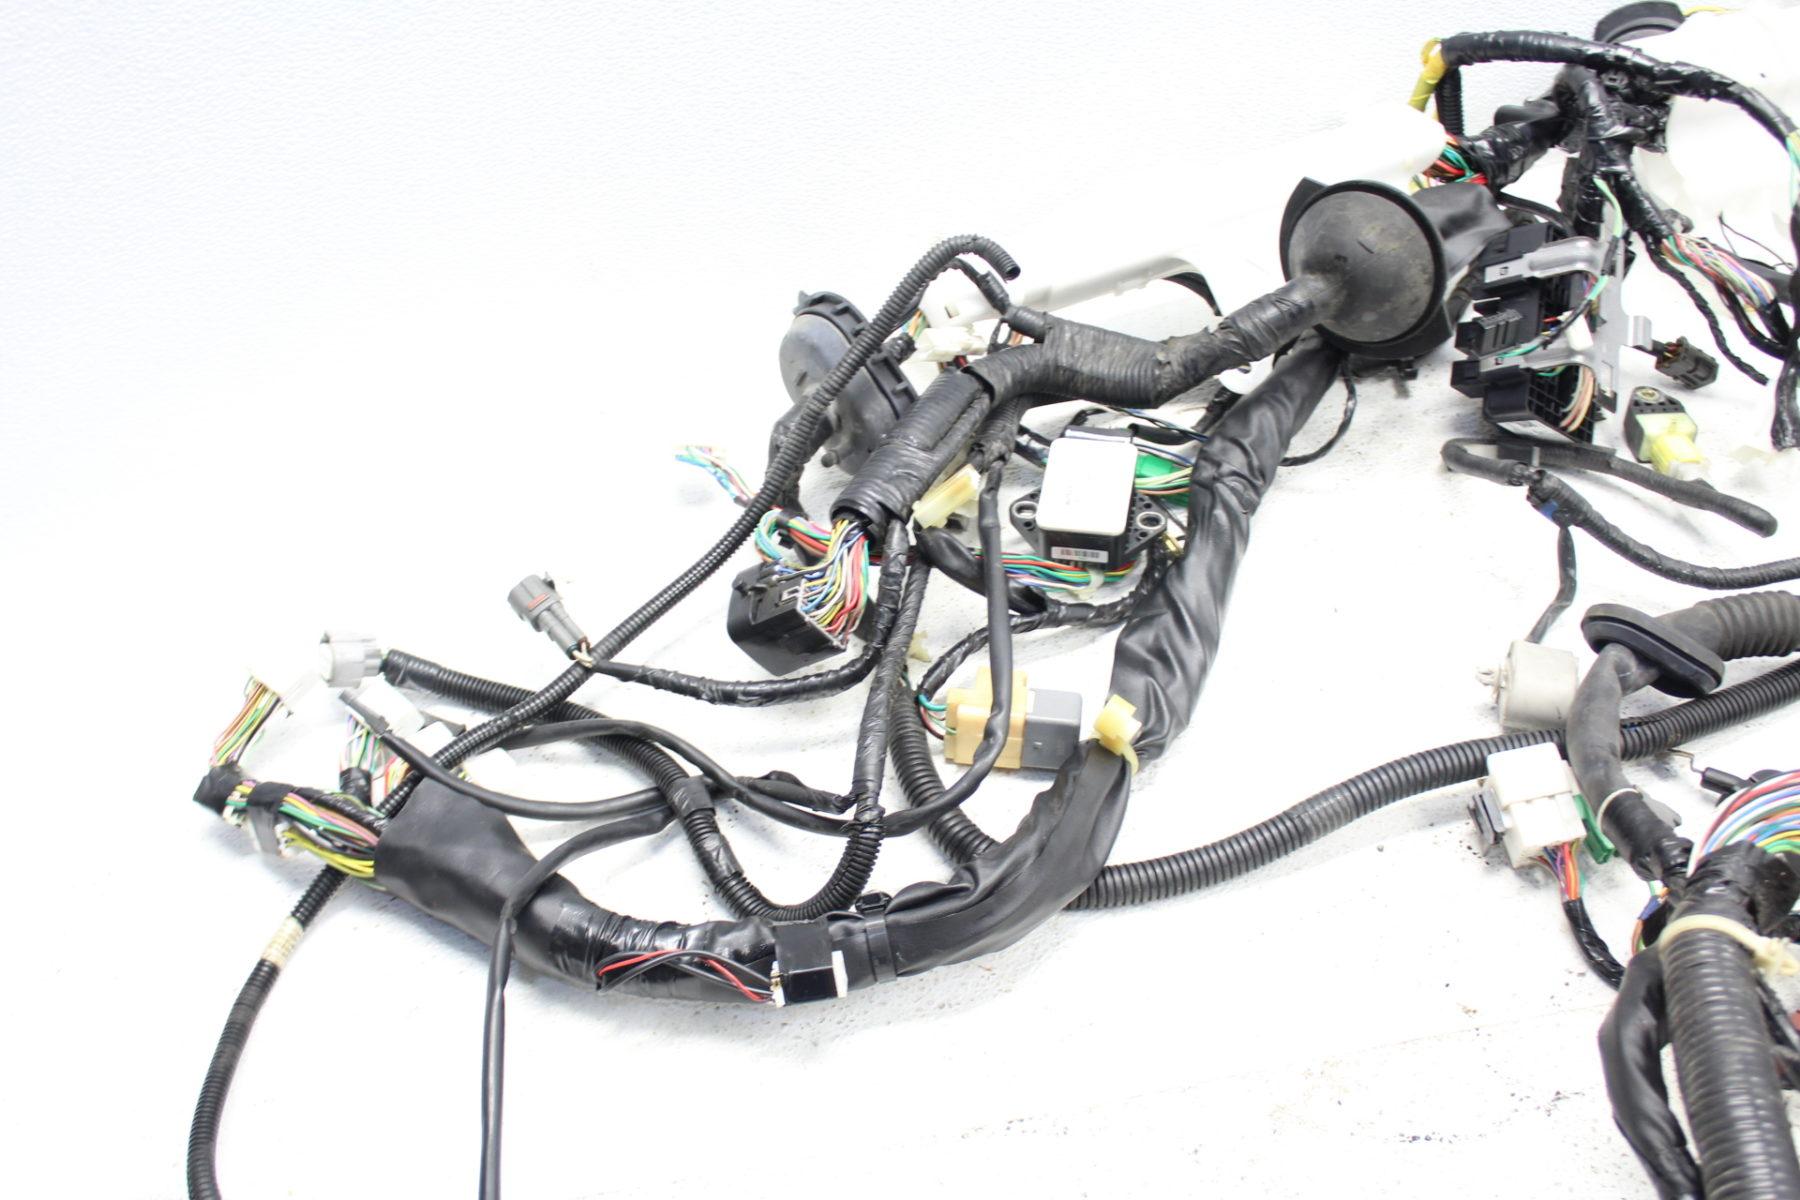 06 sti wiring harness